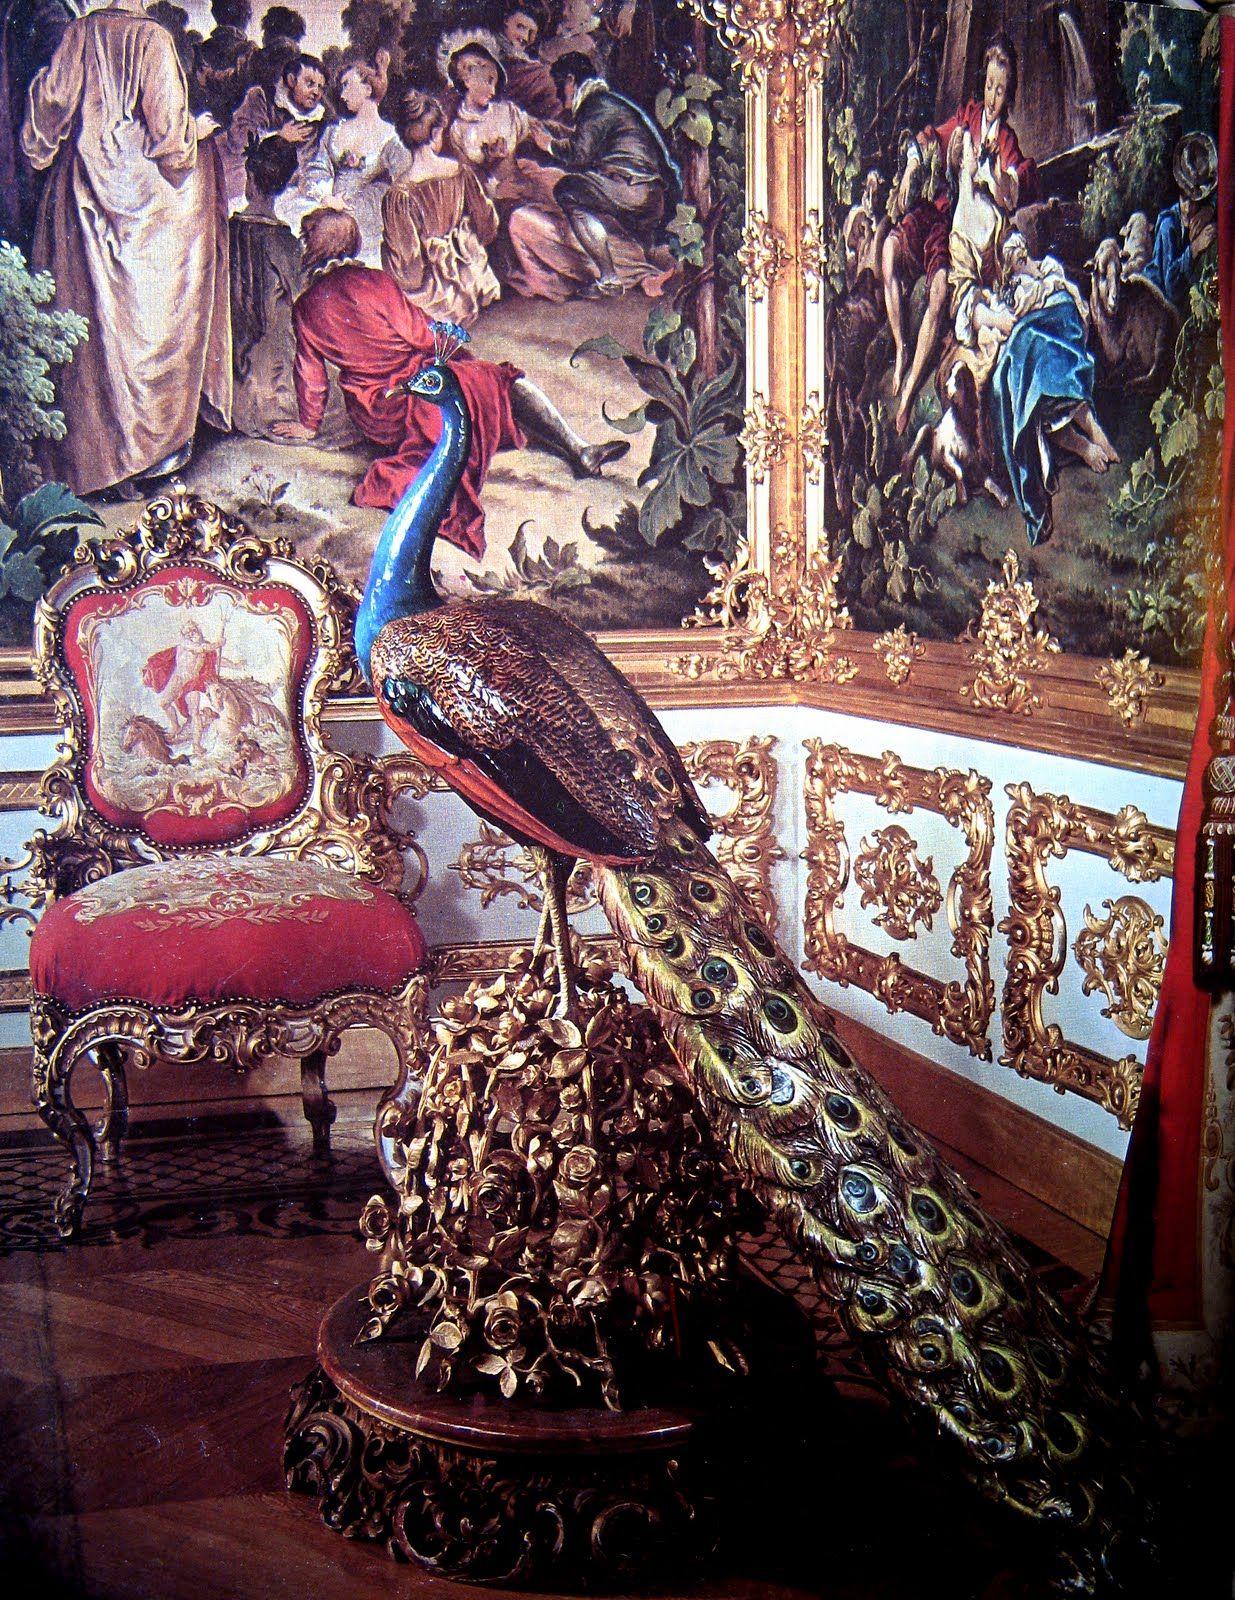 Ludwig Ii Konig Von Bayern Ludwig Linderhof Schloss Linderhof